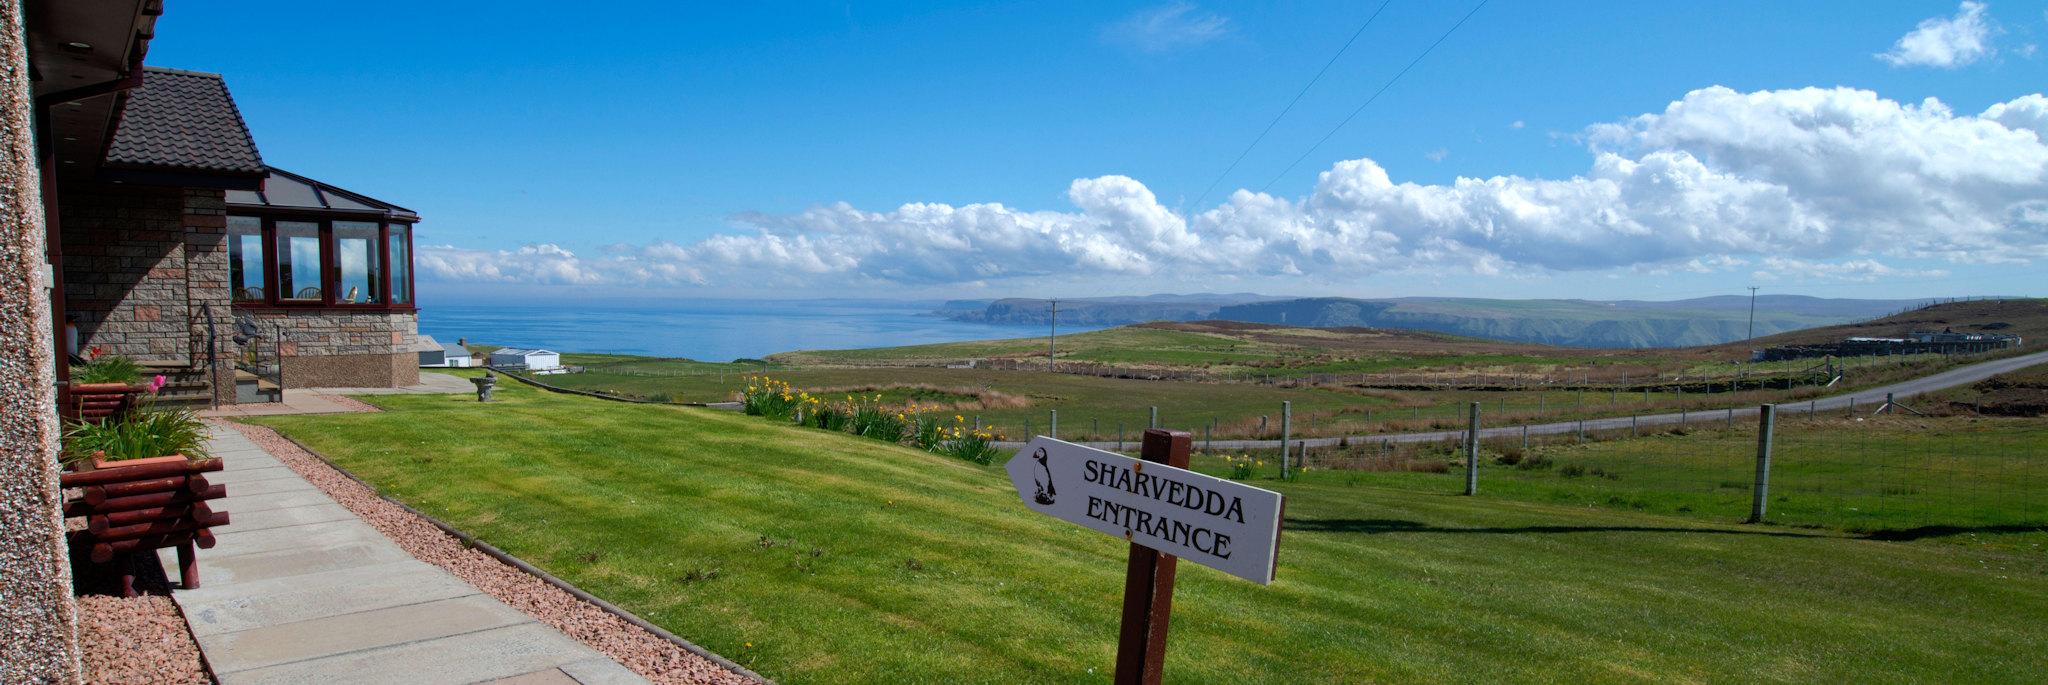 Sharvedda B&B in Sutherland, Scotland